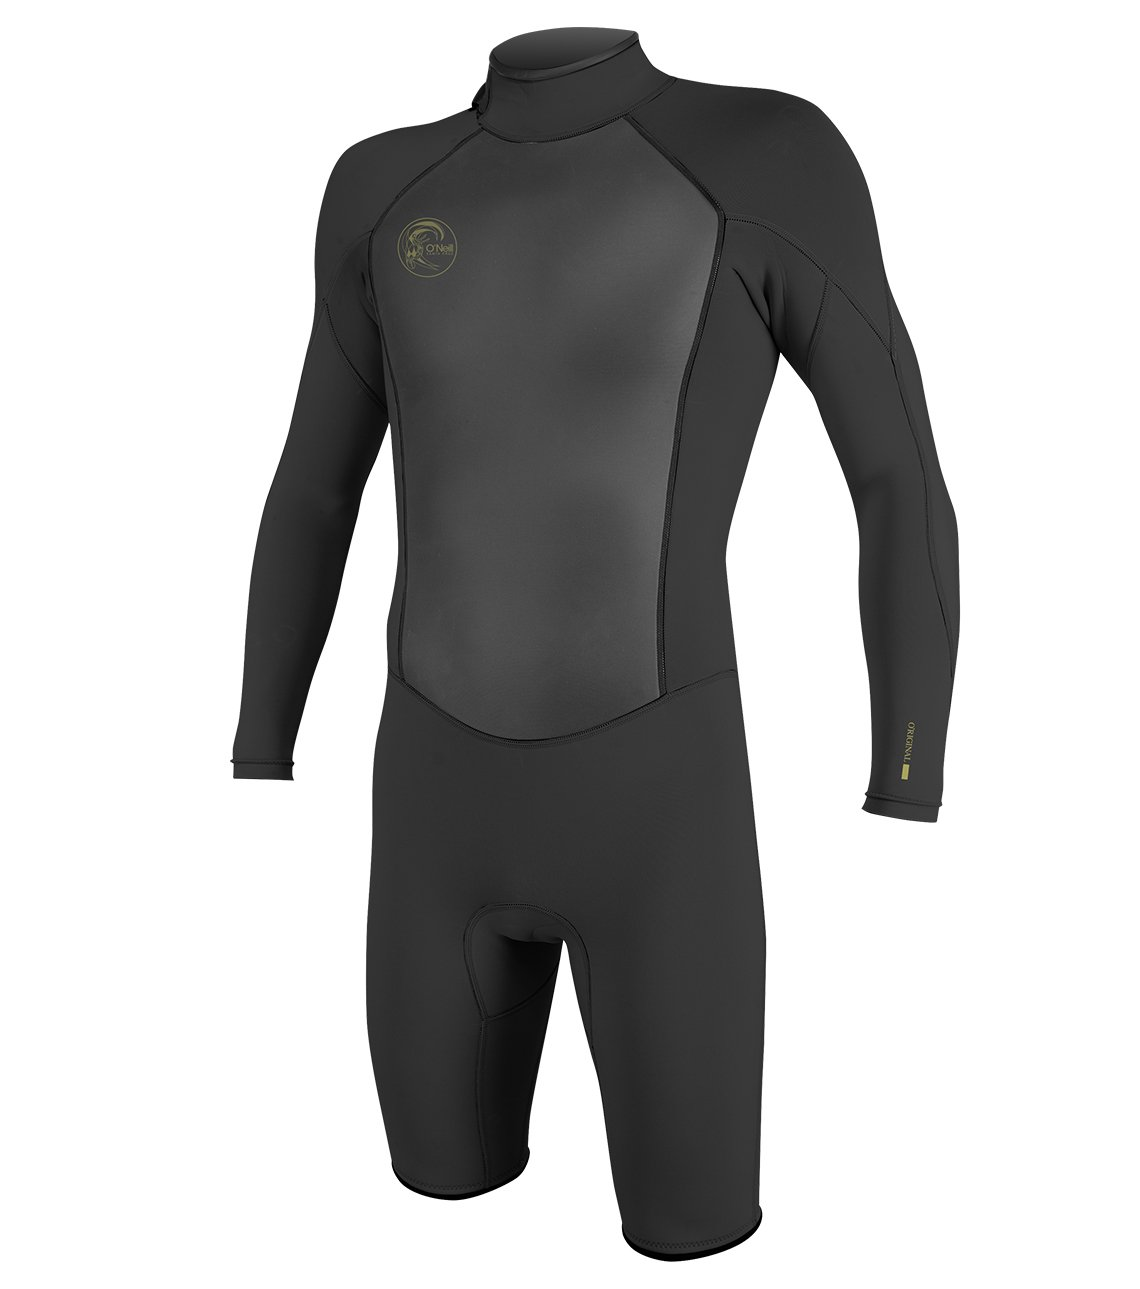 O'Neill Men's O'riginal 2mm Back Zip Long Sleeve Spring Wetsuit, Black, Small